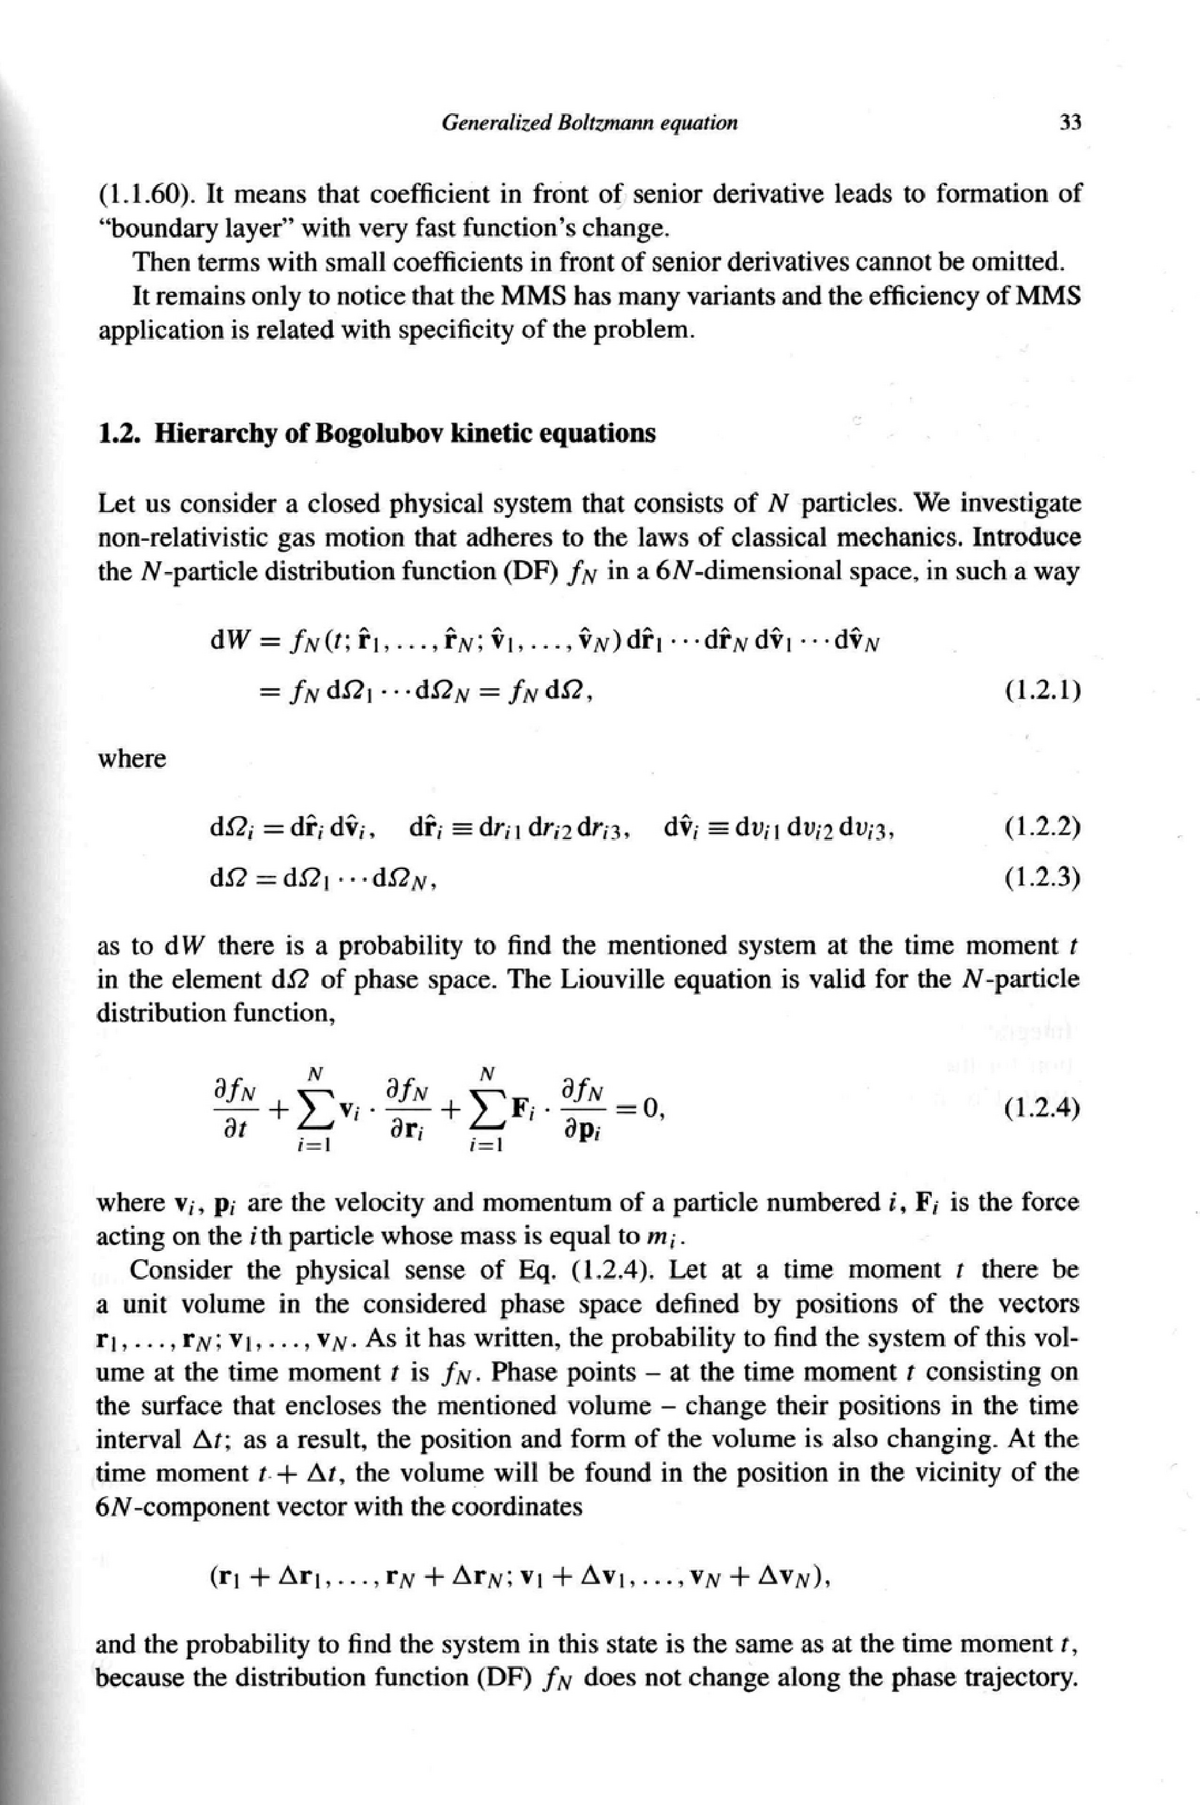 Exam 2016 - Mech 578: Advanced Thermodynamics - StuDocu